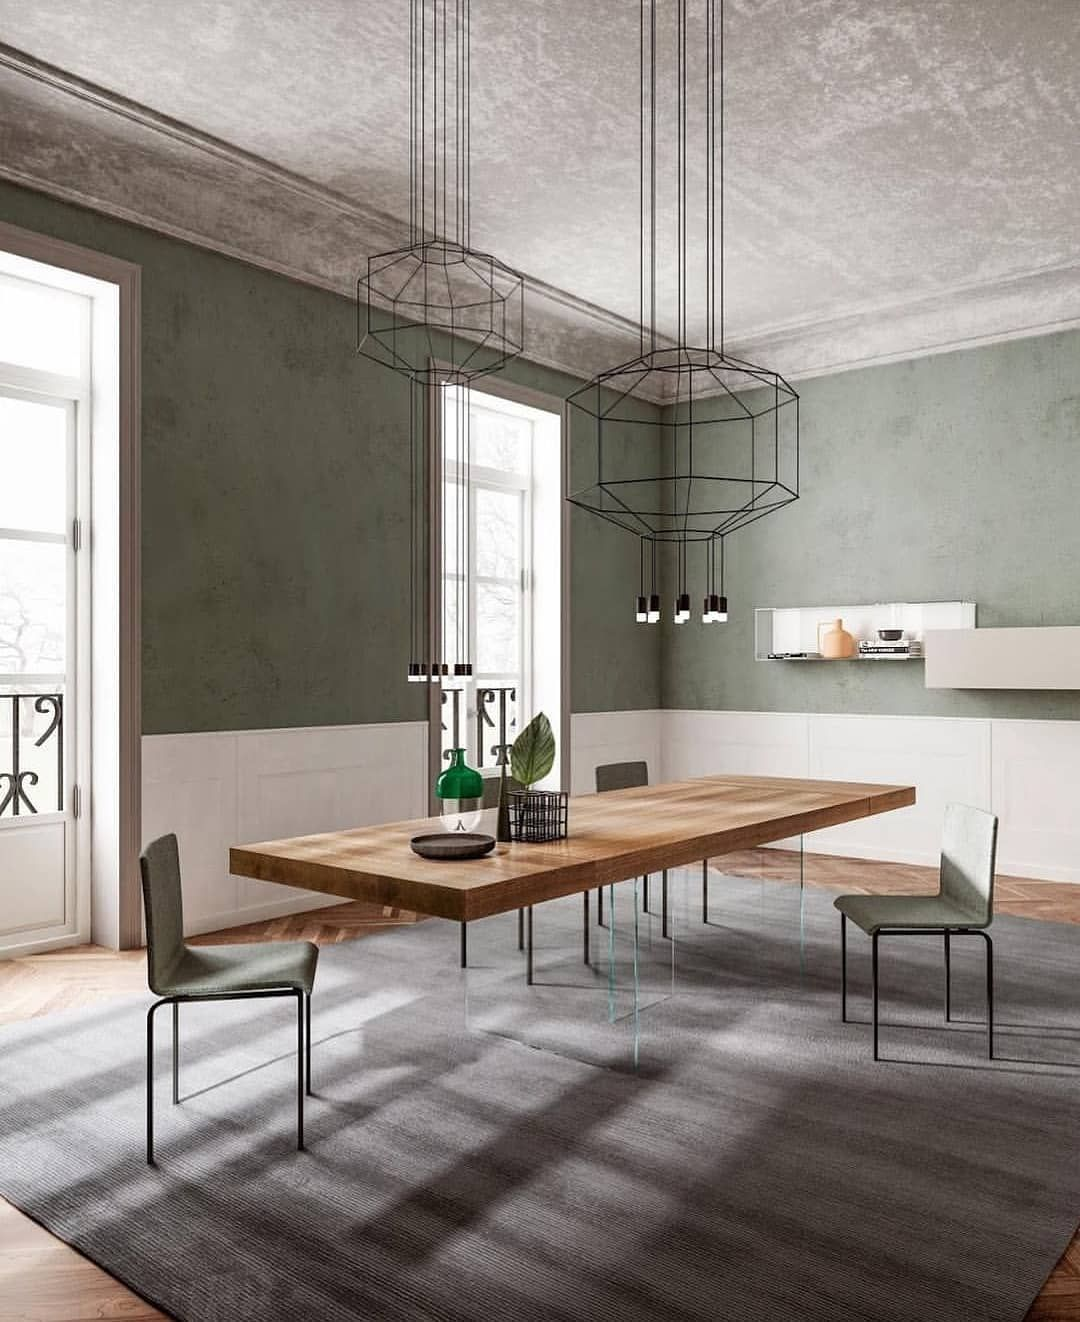 Home Design Ideas Instagram: Interior Design & Home Decor On Instagram : Light, Like